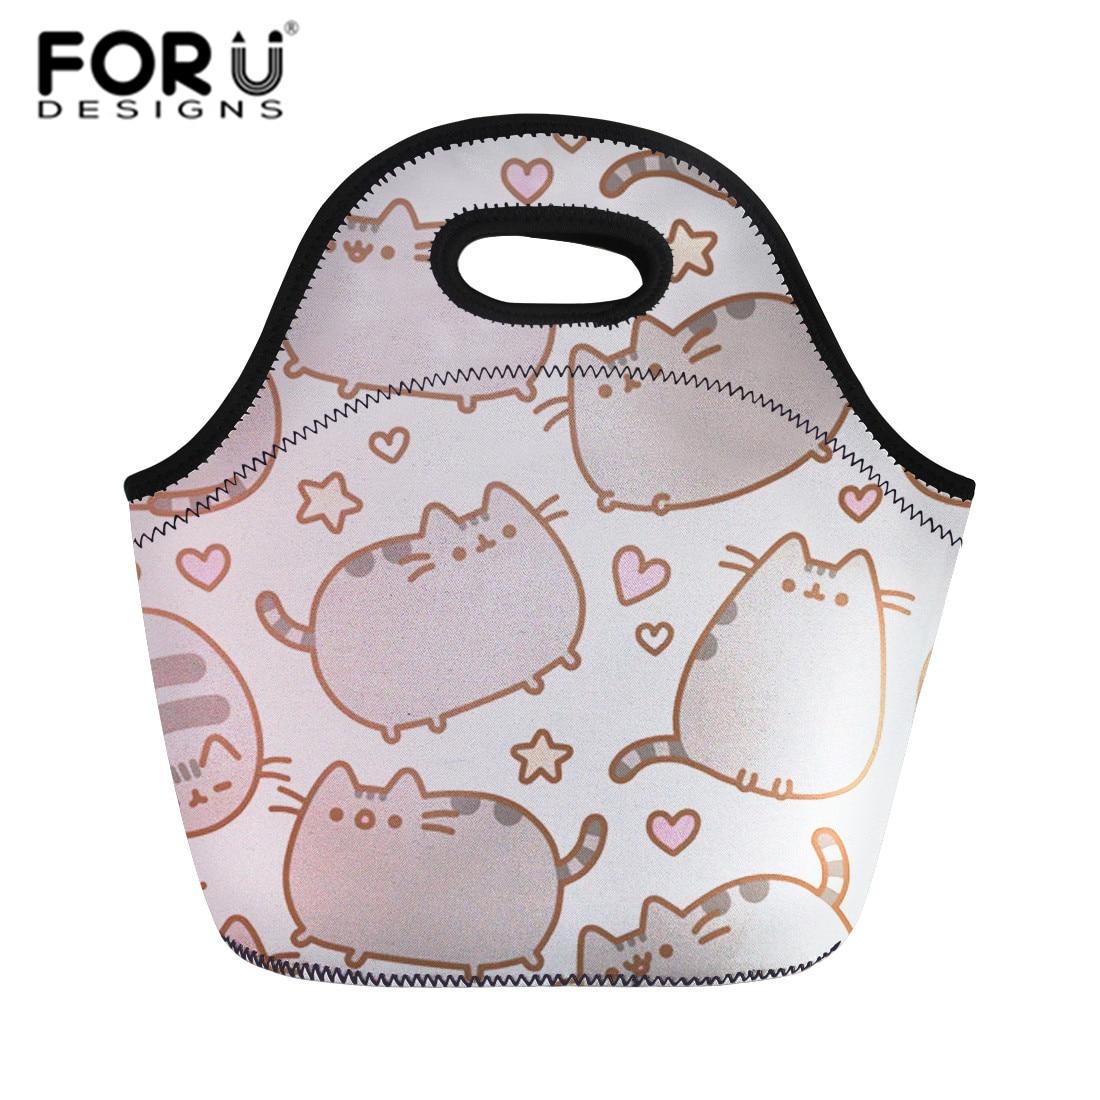 FORUDESIGNS Cartoon Pusheen Cat Lunch Bags For Kids School Thermal Bag Lunch Box Food Picnic Bags Totes Portable Storage Bag Sac